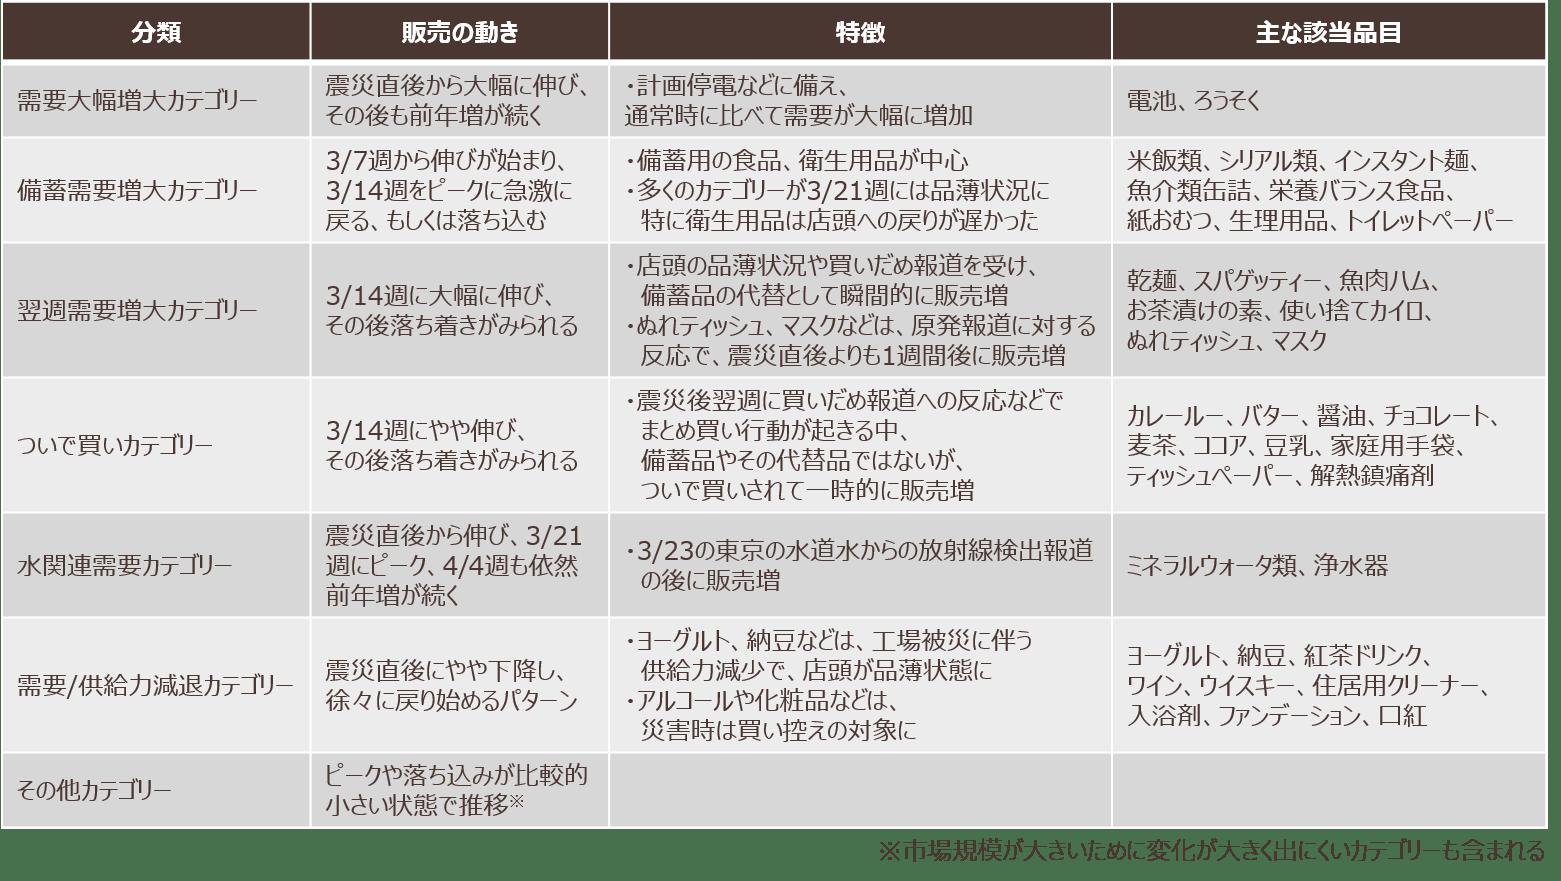 shinsai_04.png